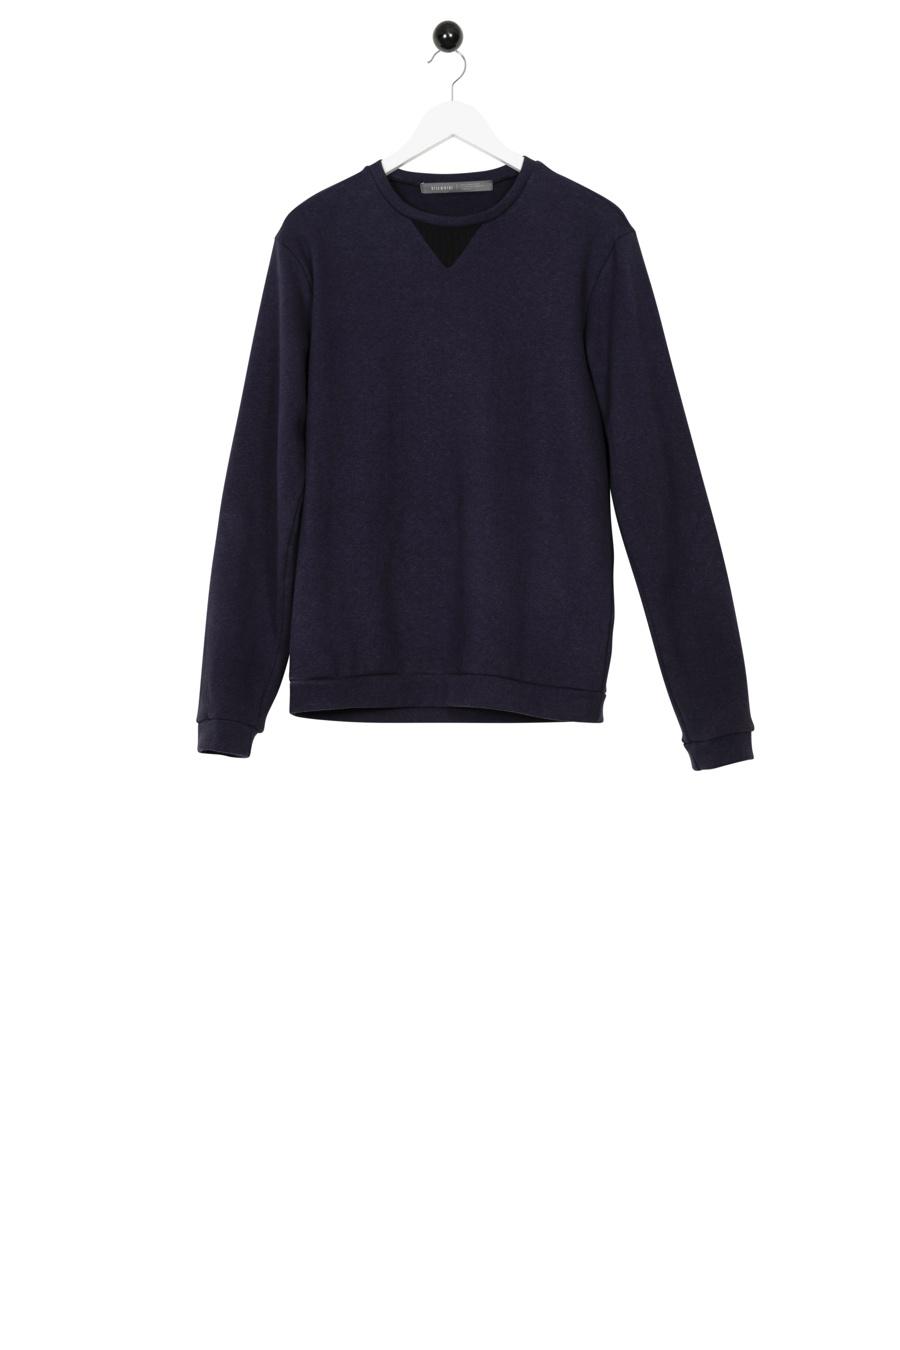 Dijon Sweater